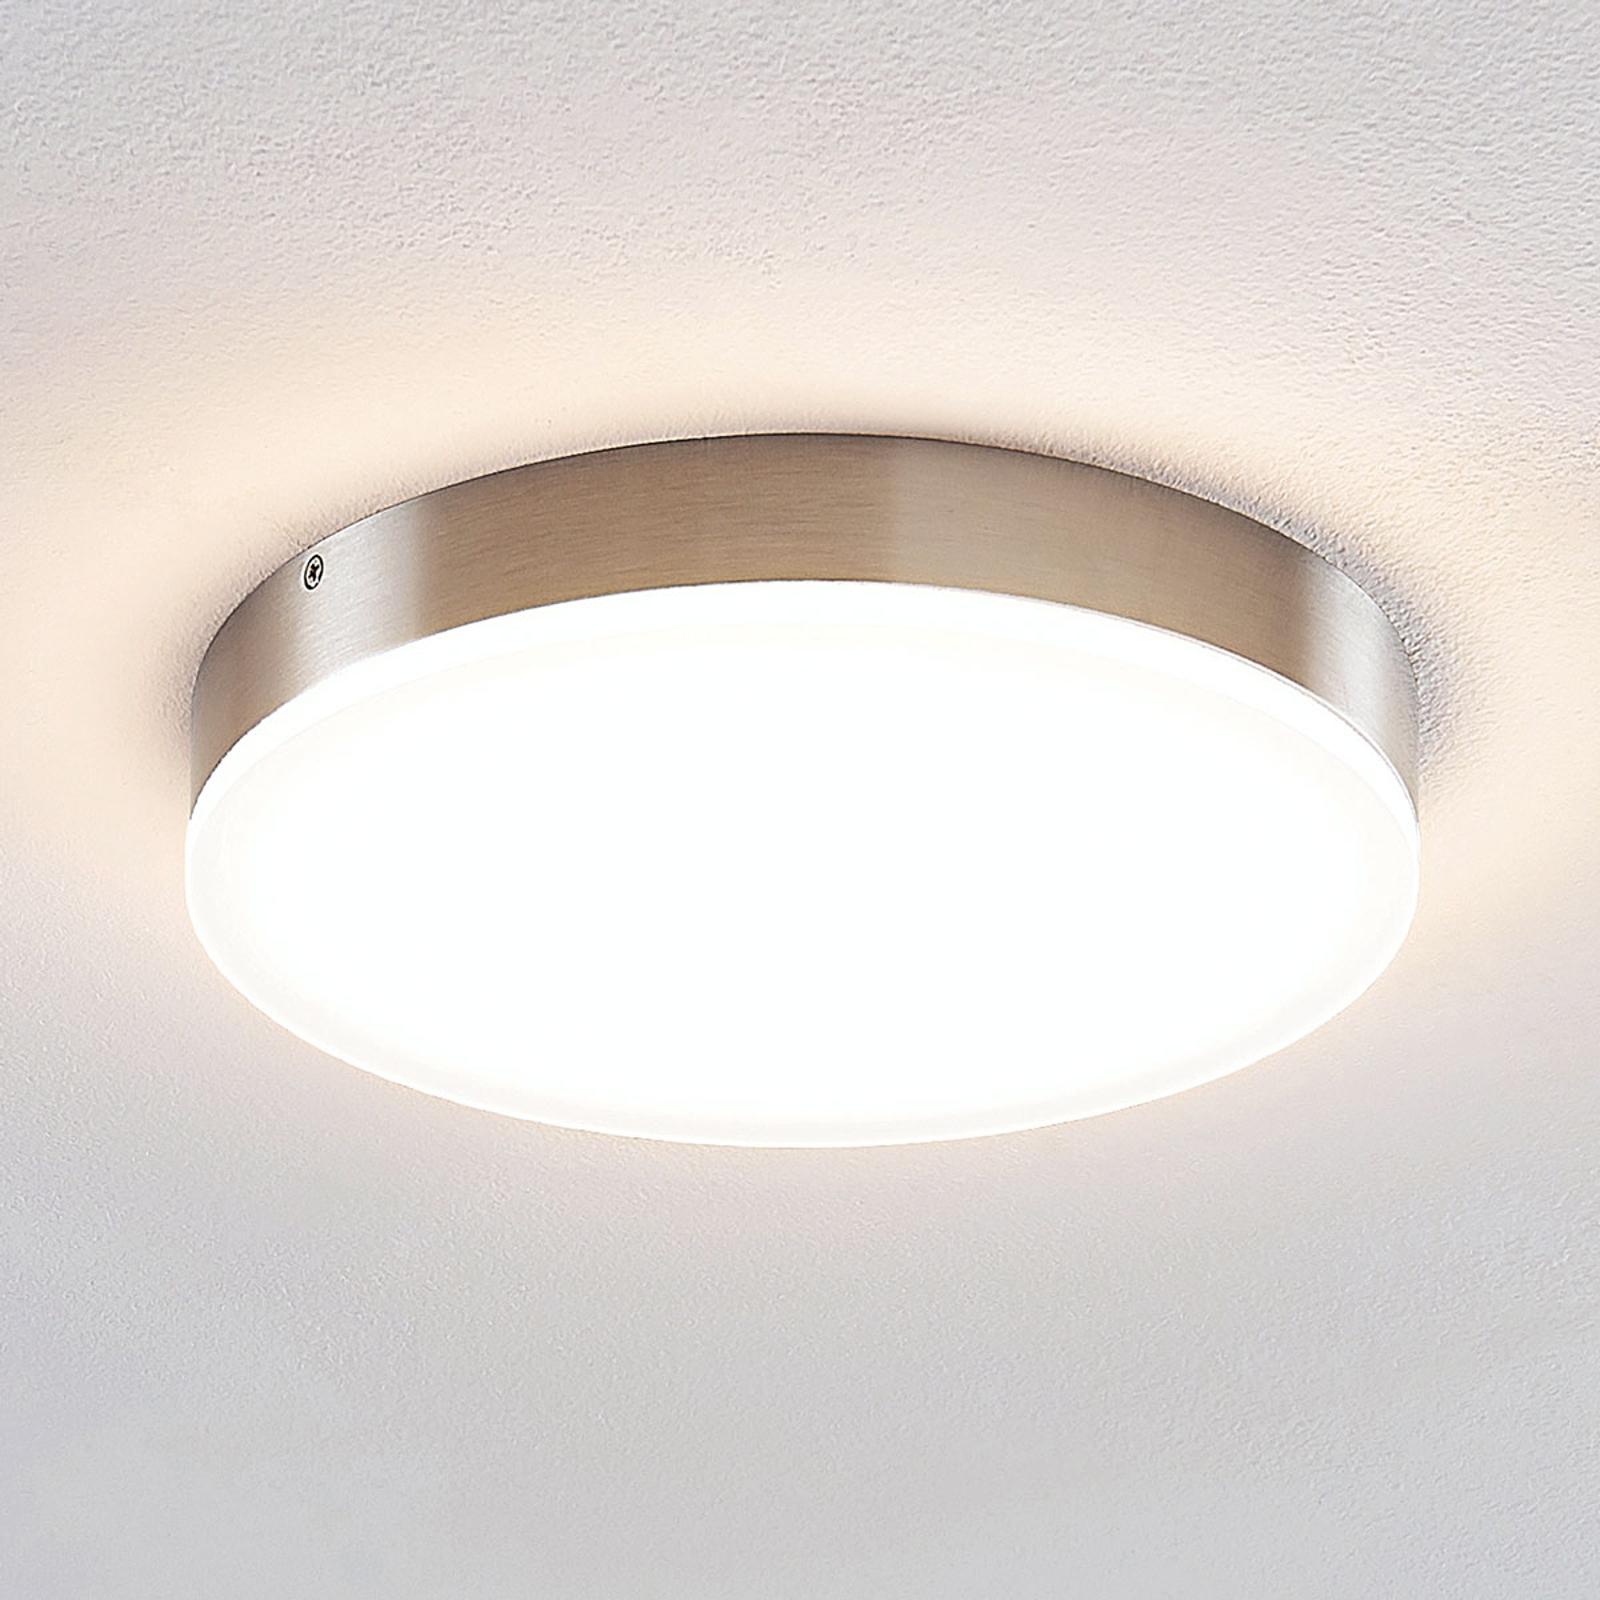 Lindby Leonta lampa sufitowa LED, nikiel Ø 25 cm